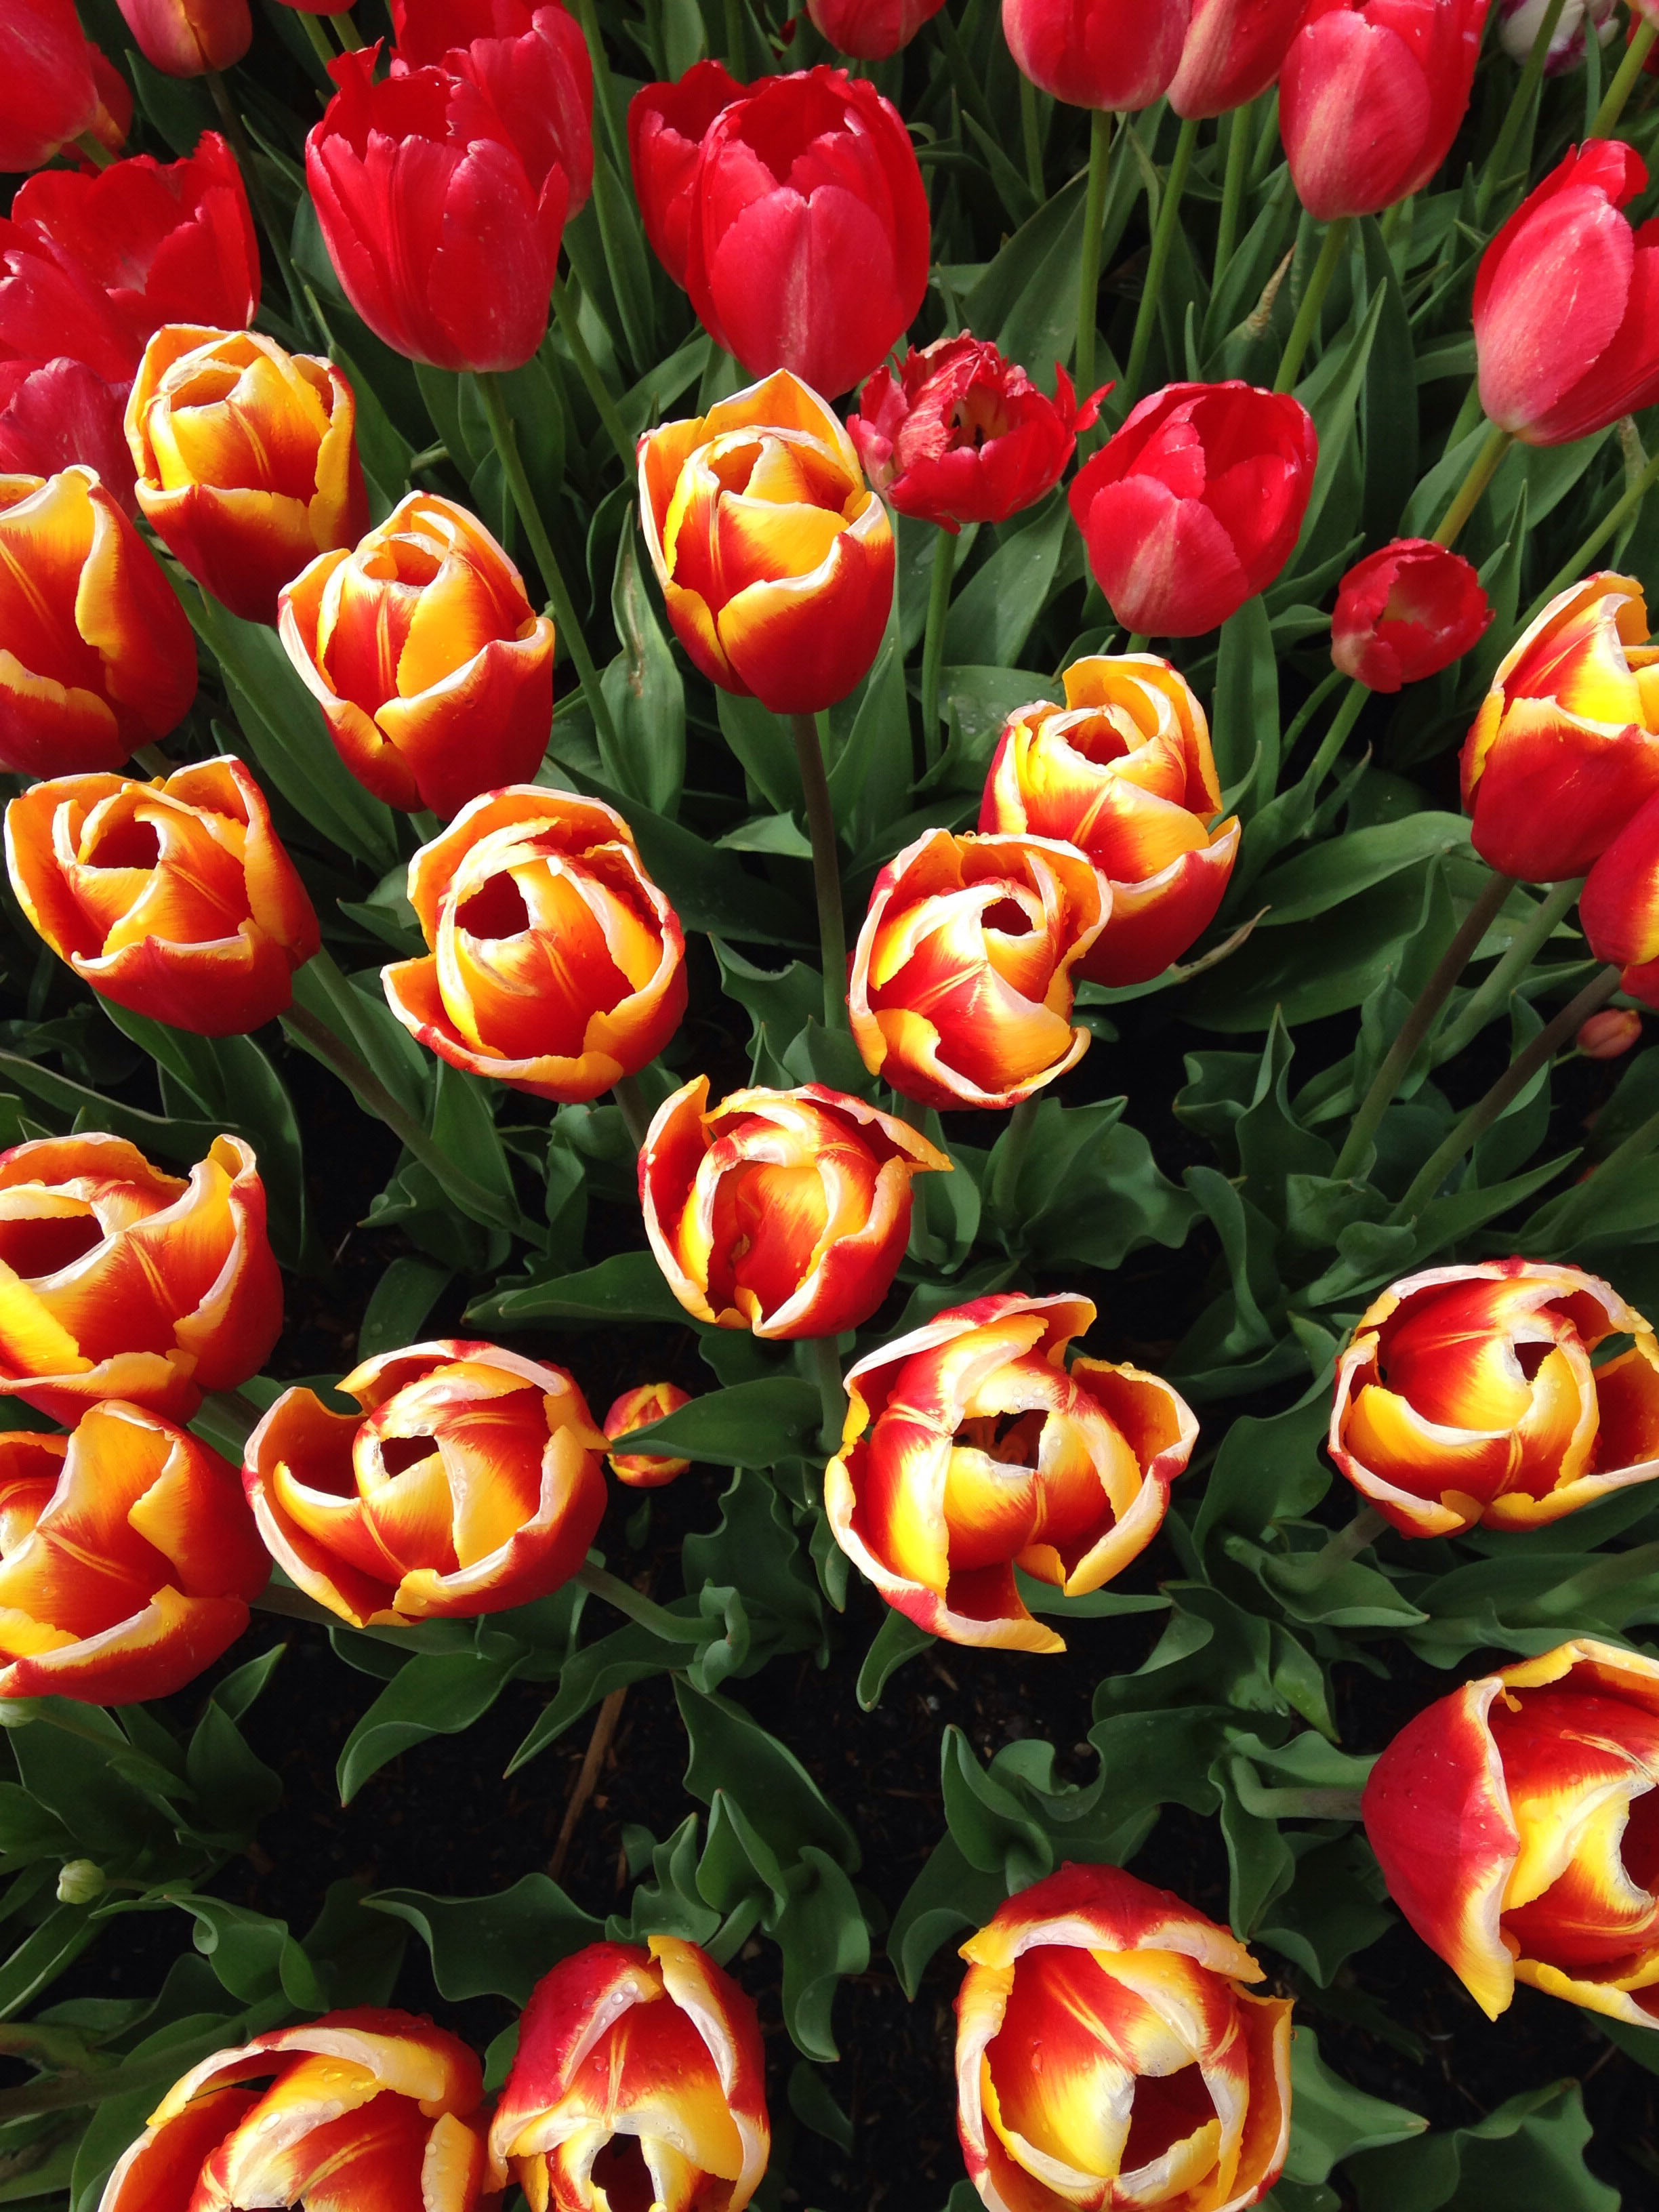 Tulips closeup red